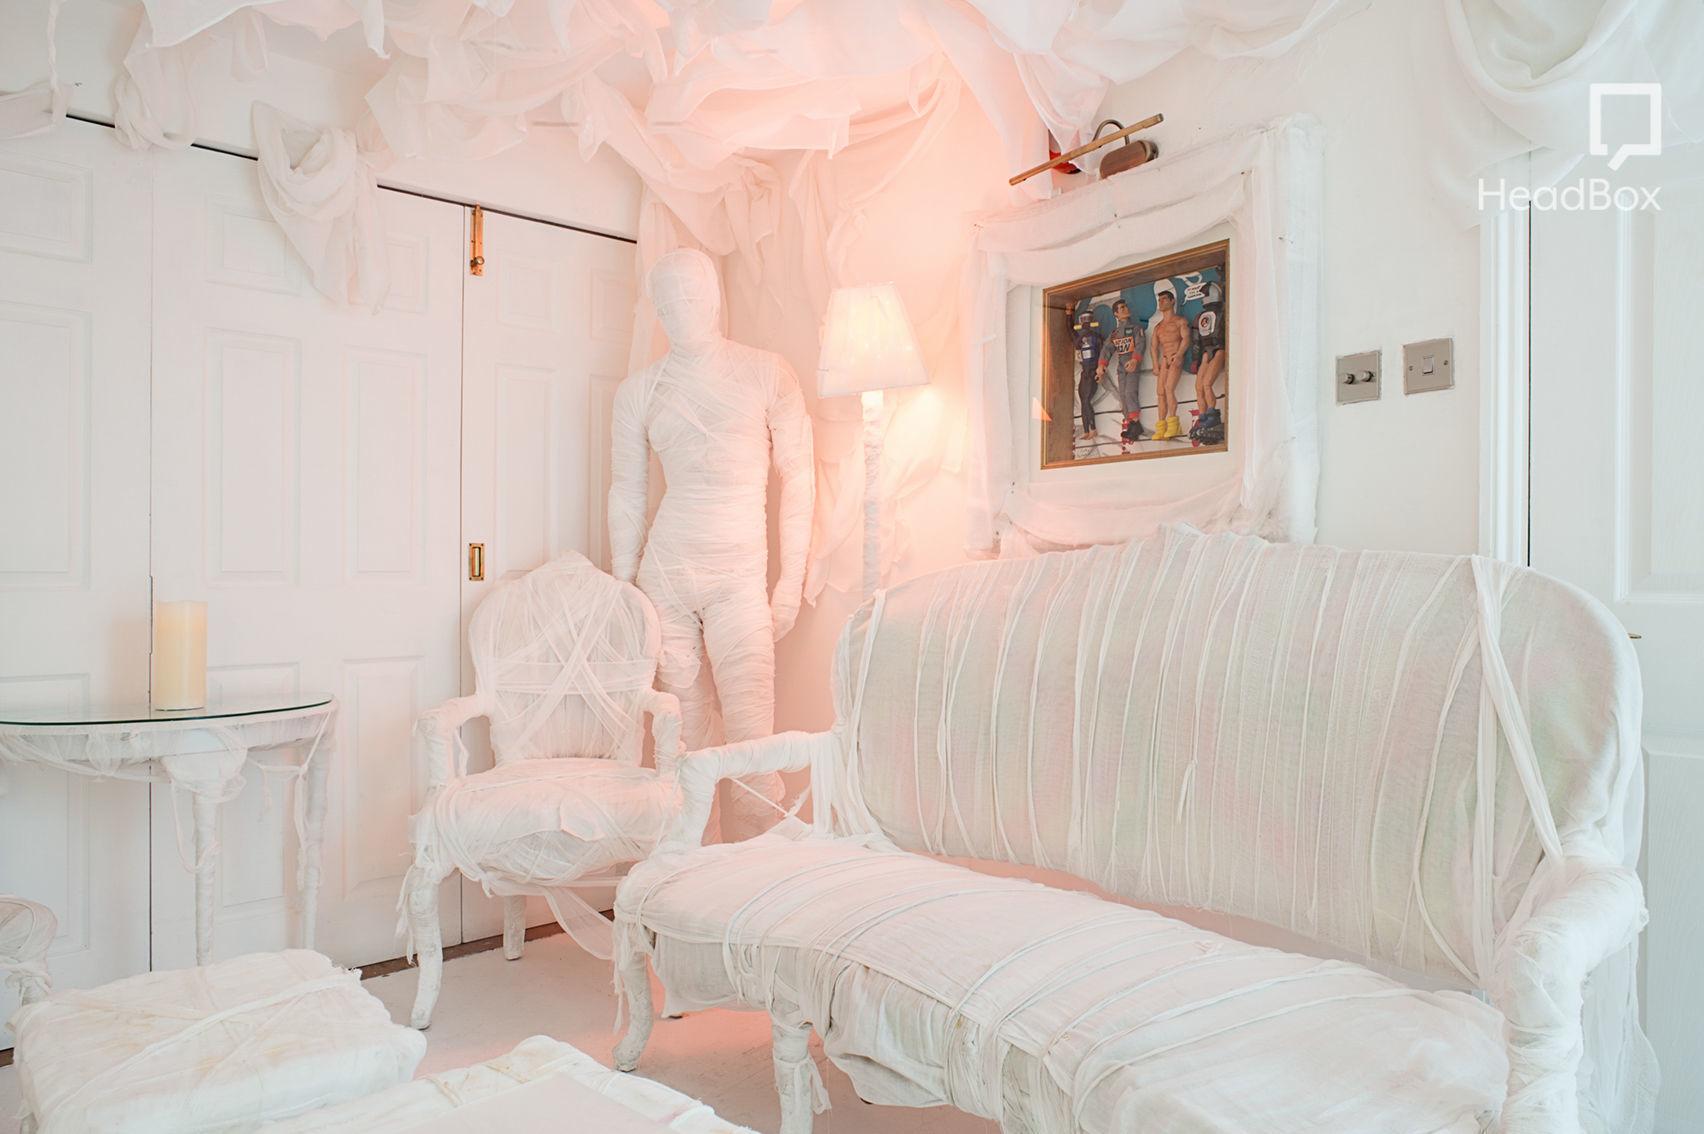 Bandage Room, Evening Hire, ninetyeight bar